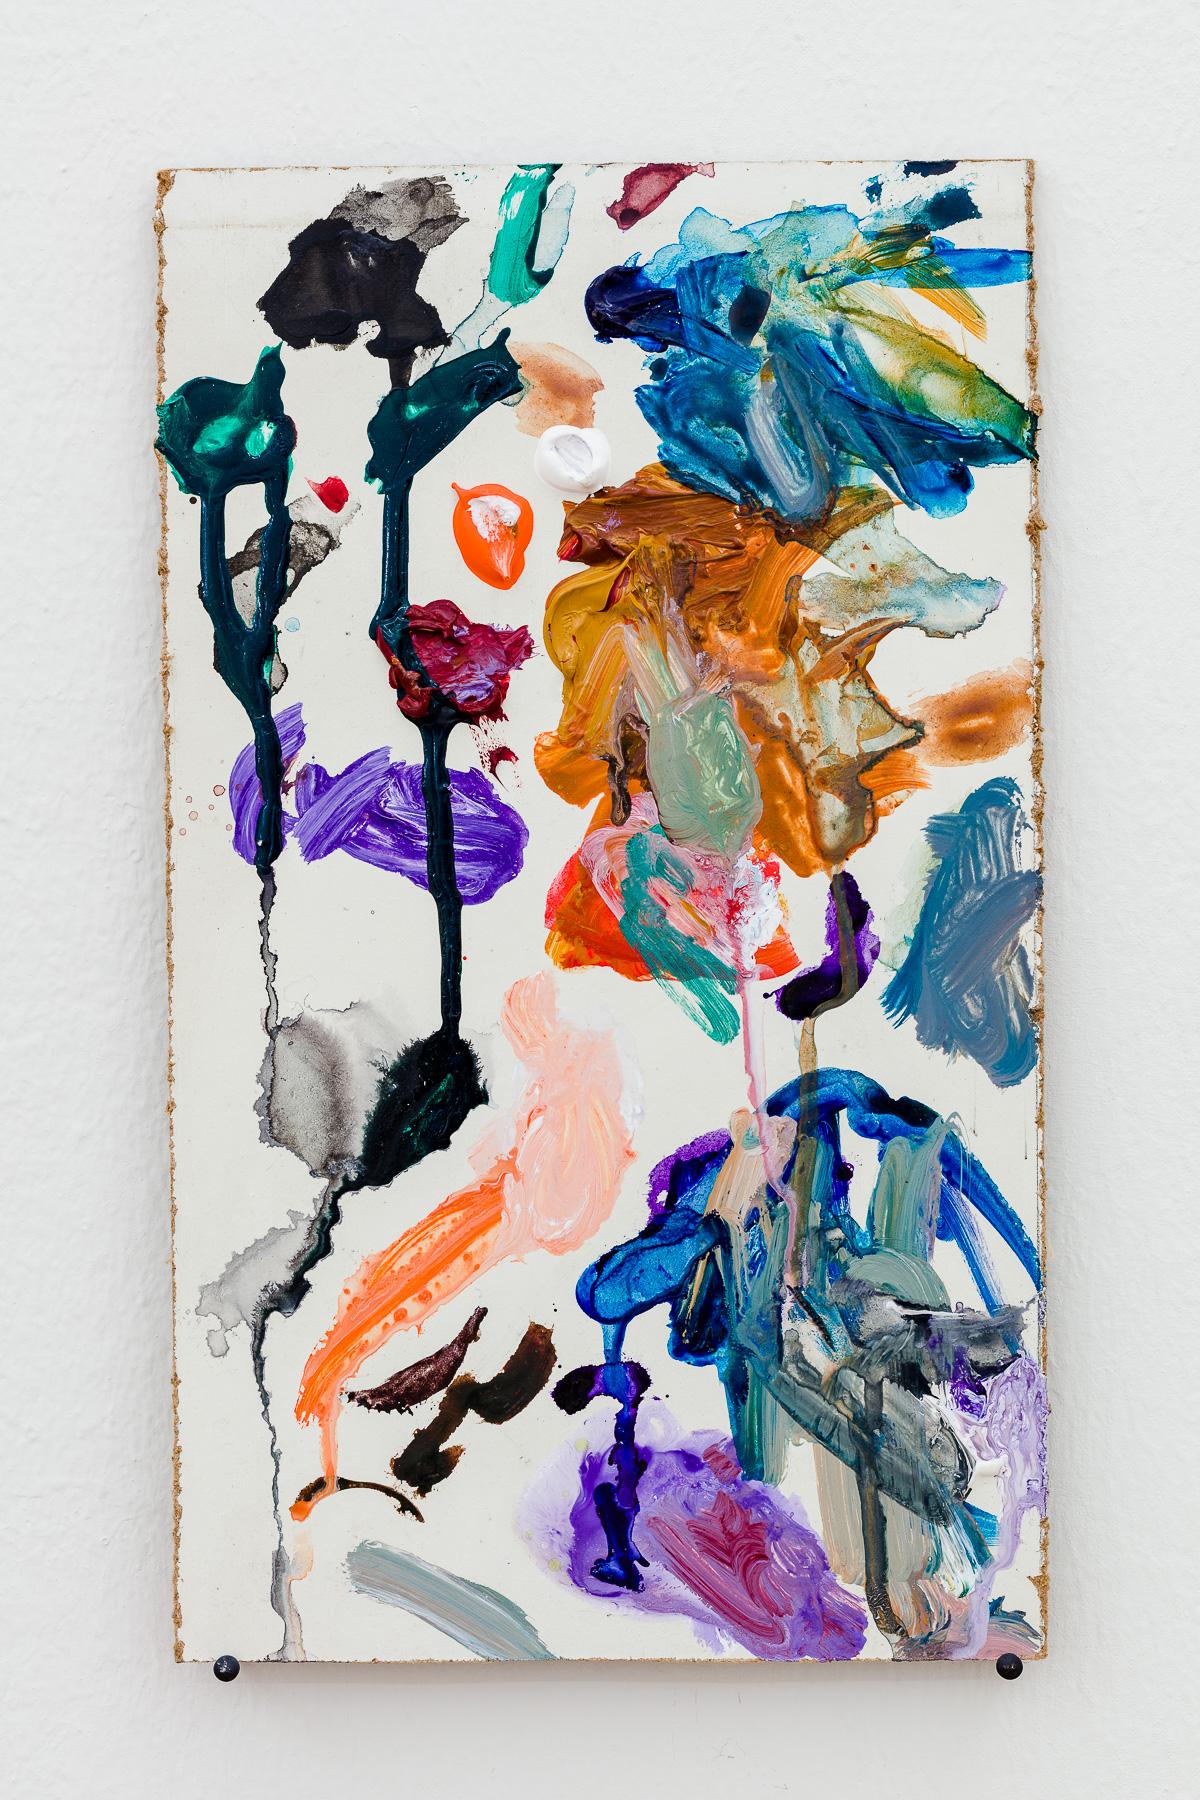 2019_05_20_Elke-Krystufek_Croy-Nielsen_by-kunst-dokumentation-com_019_web.jpg